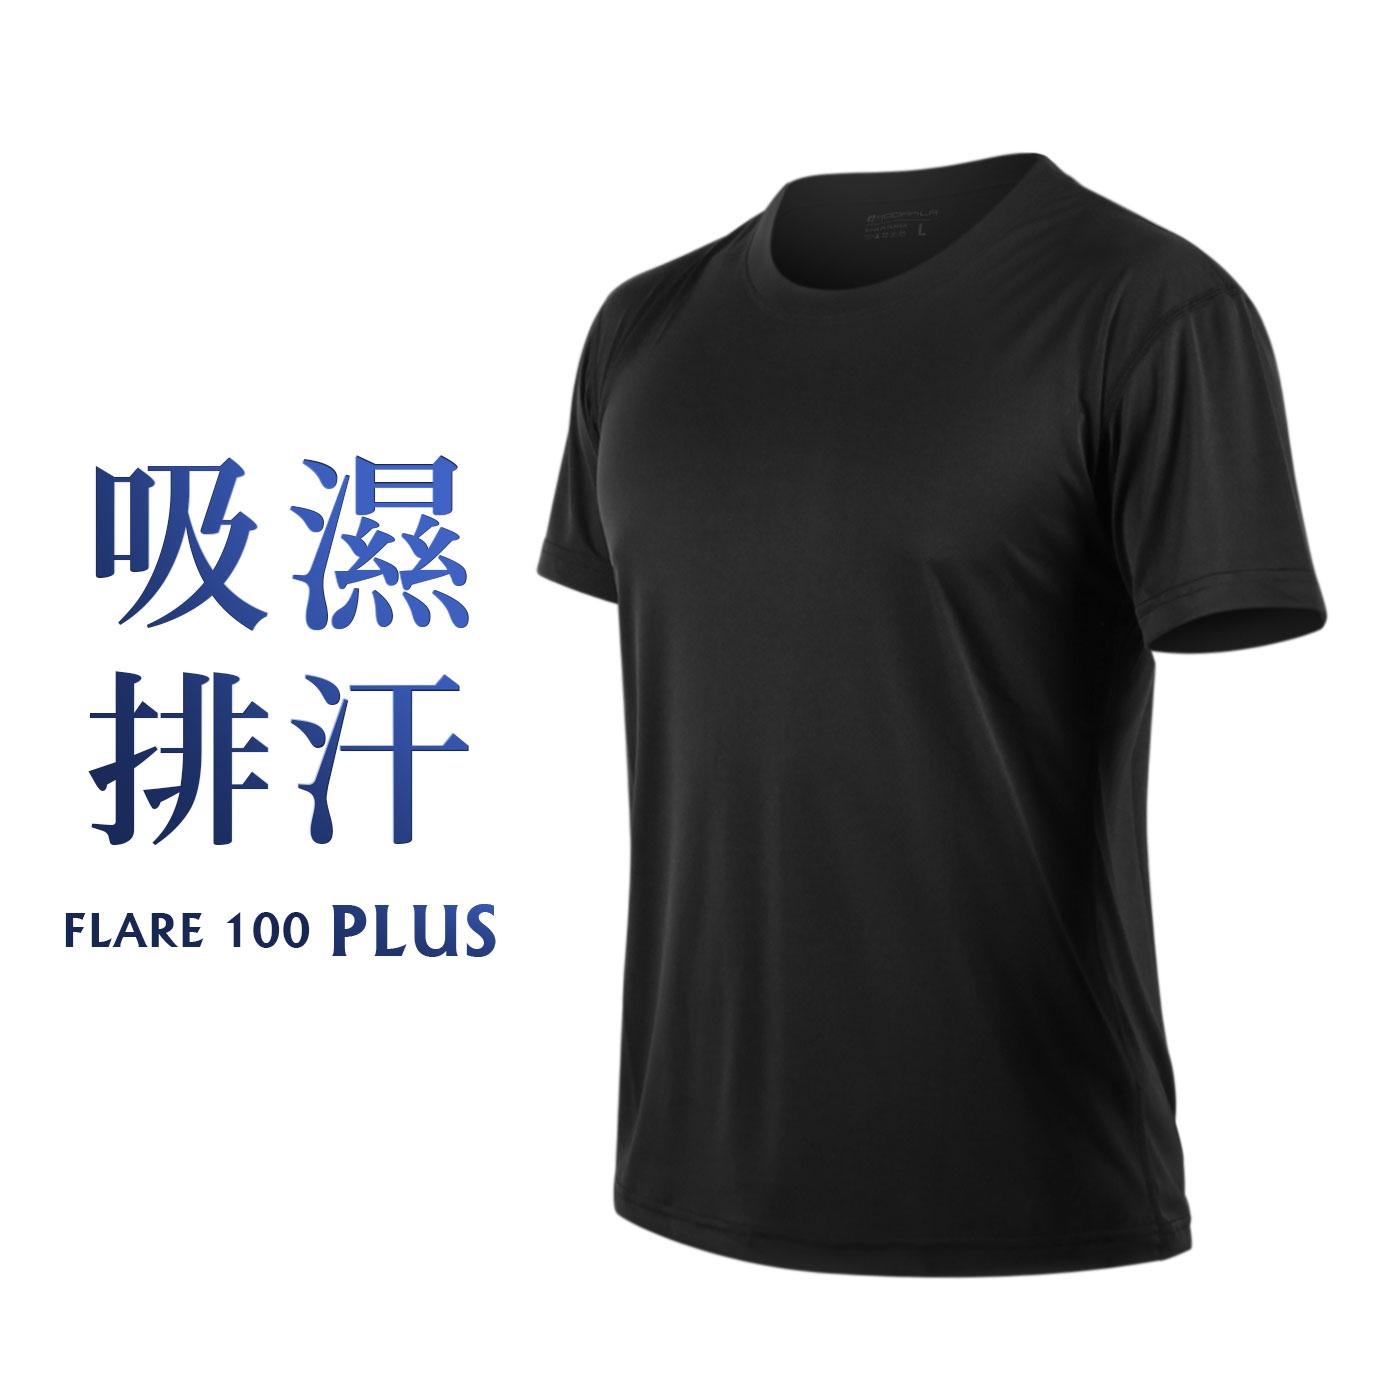 HODARLA FLARE 100 PLUS 吸濕排汗衫 3153701 - 黑